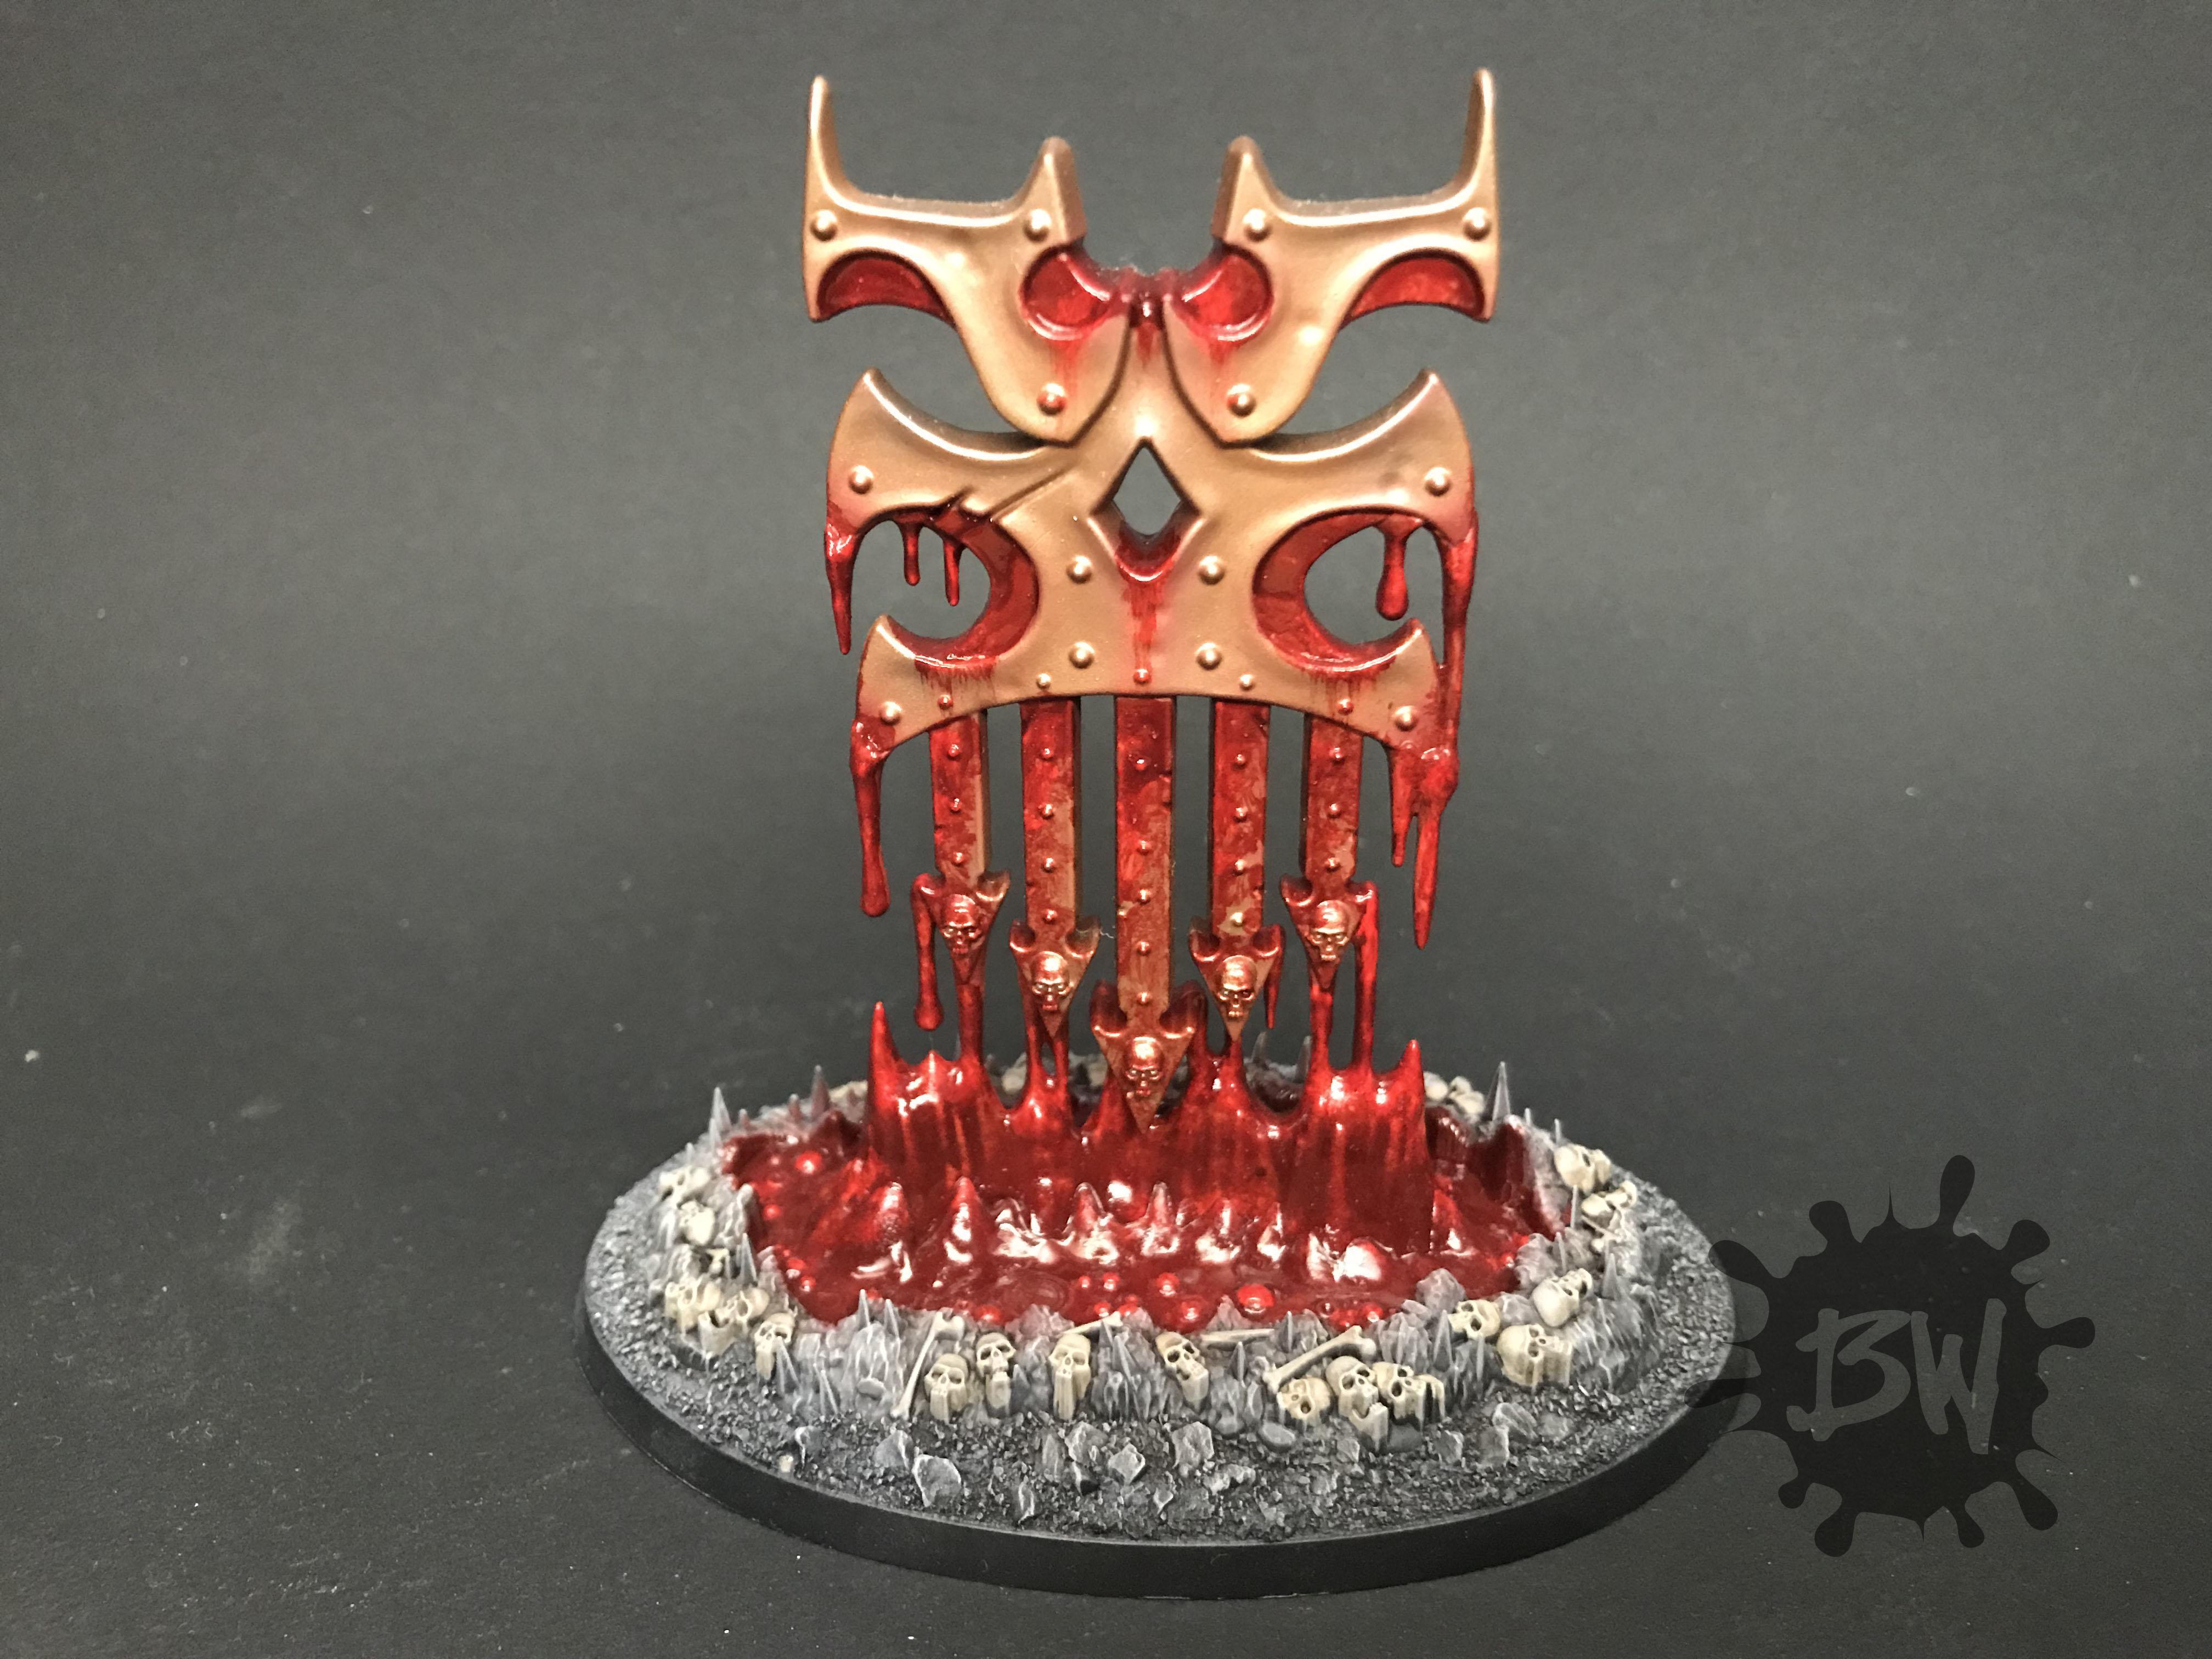 Age Of Sigmar, Bleeding Icon, Bw, Chaos, Hexgorger Skulls, Judgements Of Khorne, Khorne, Warhammer Fantasy, Wrath-axe